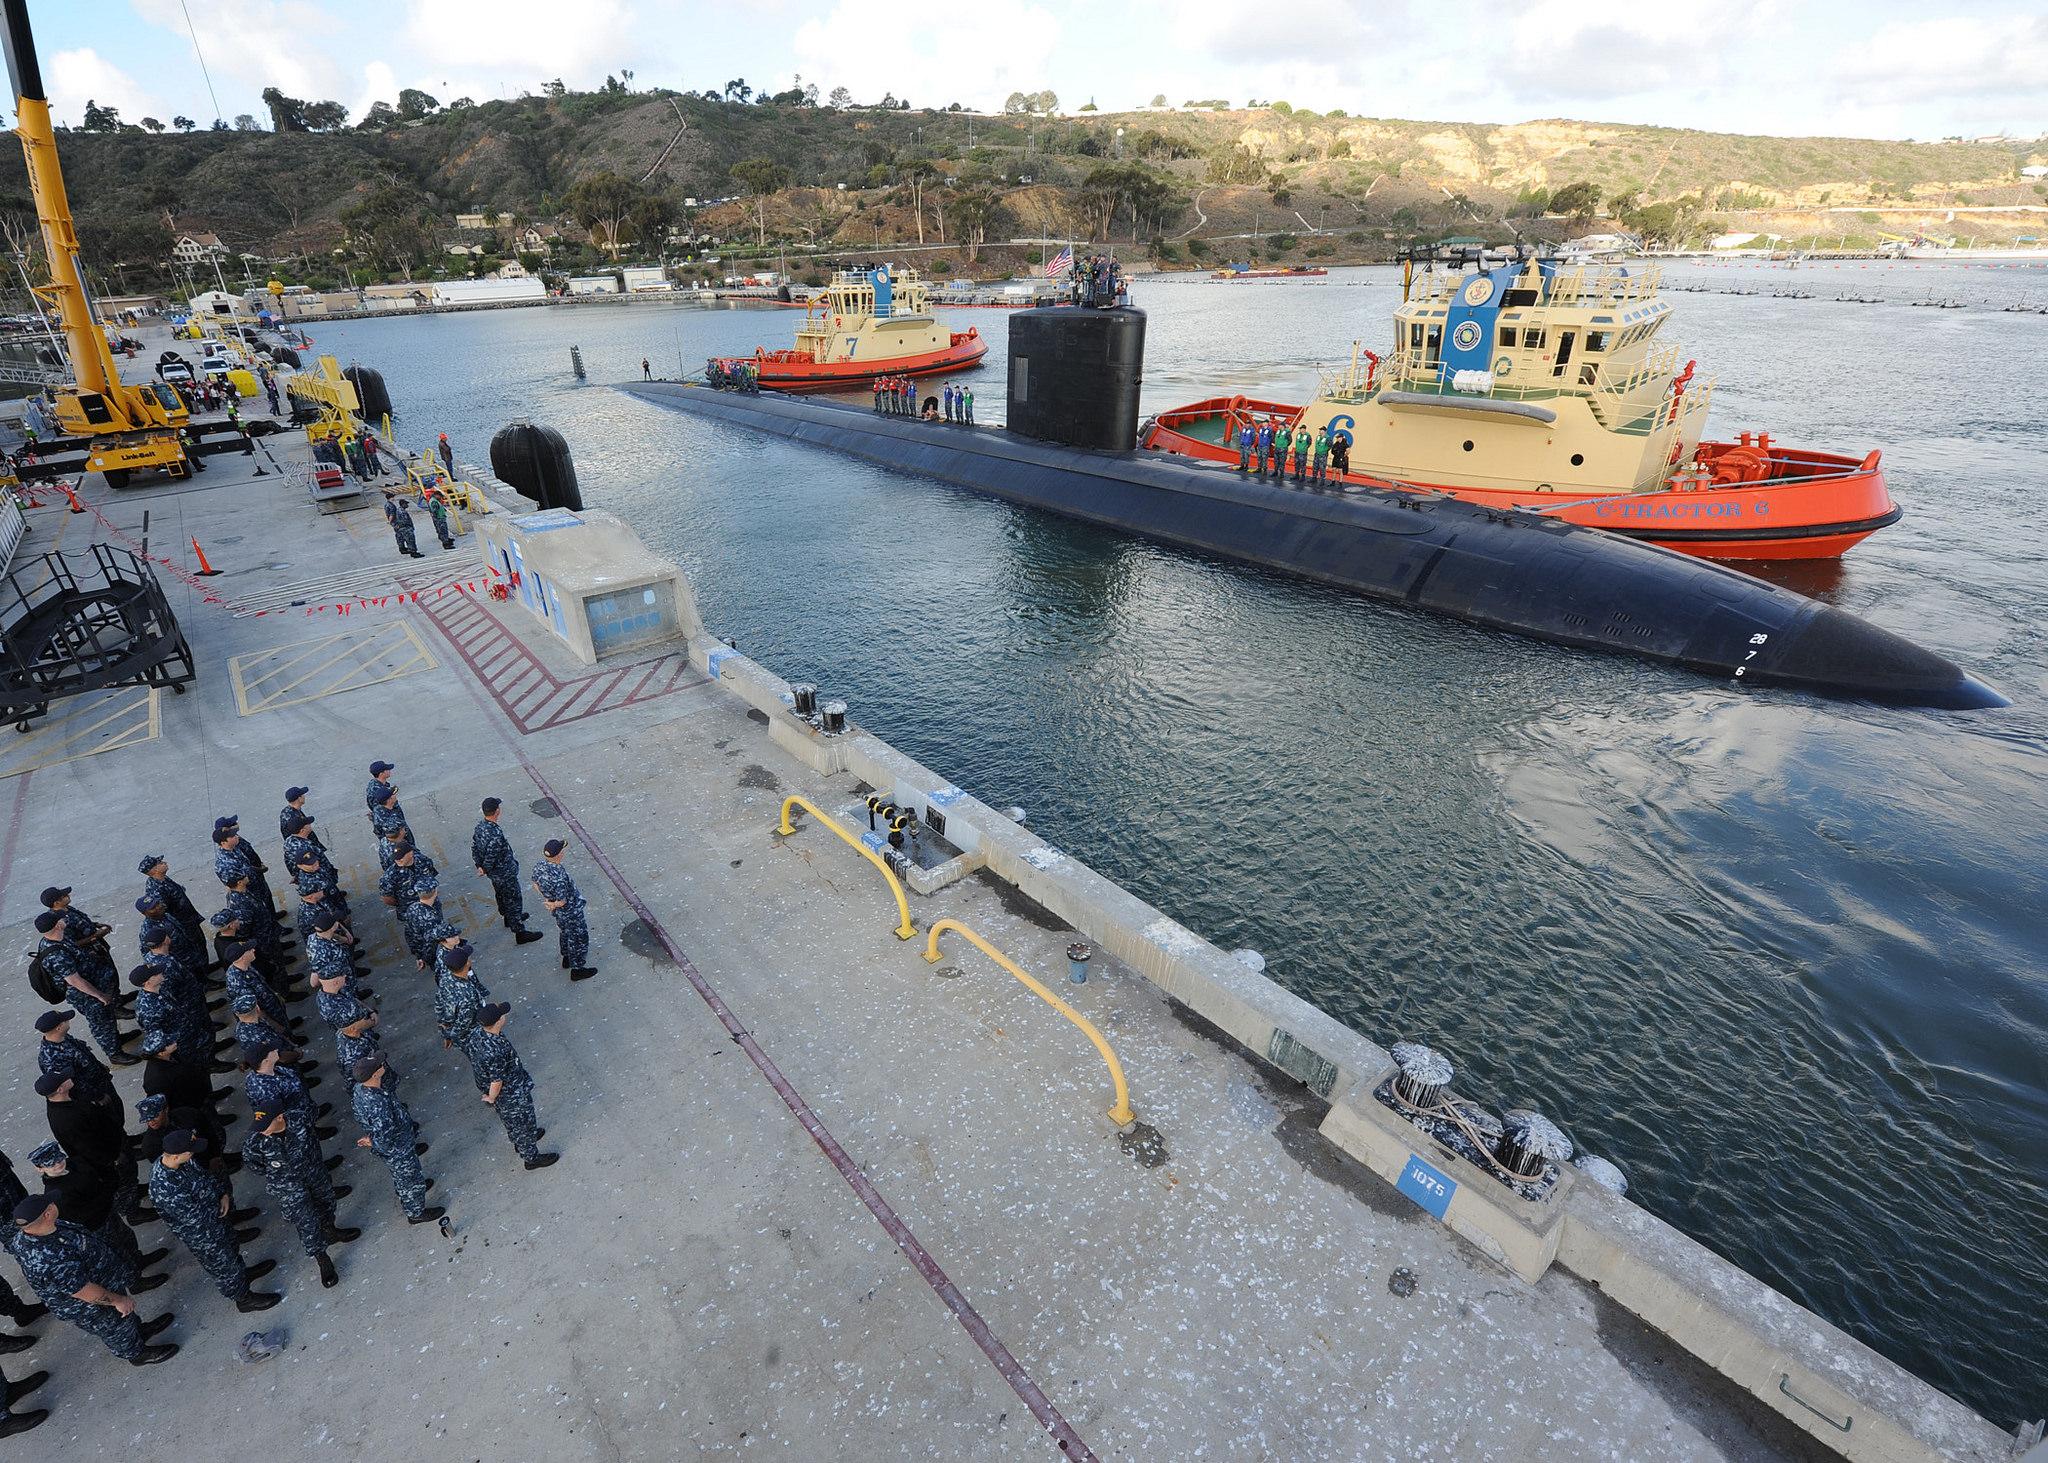 USS ALEXANDRIA SSN-757 Ankunft San Diego am 10.11.2015 Bild: U.S. Navy